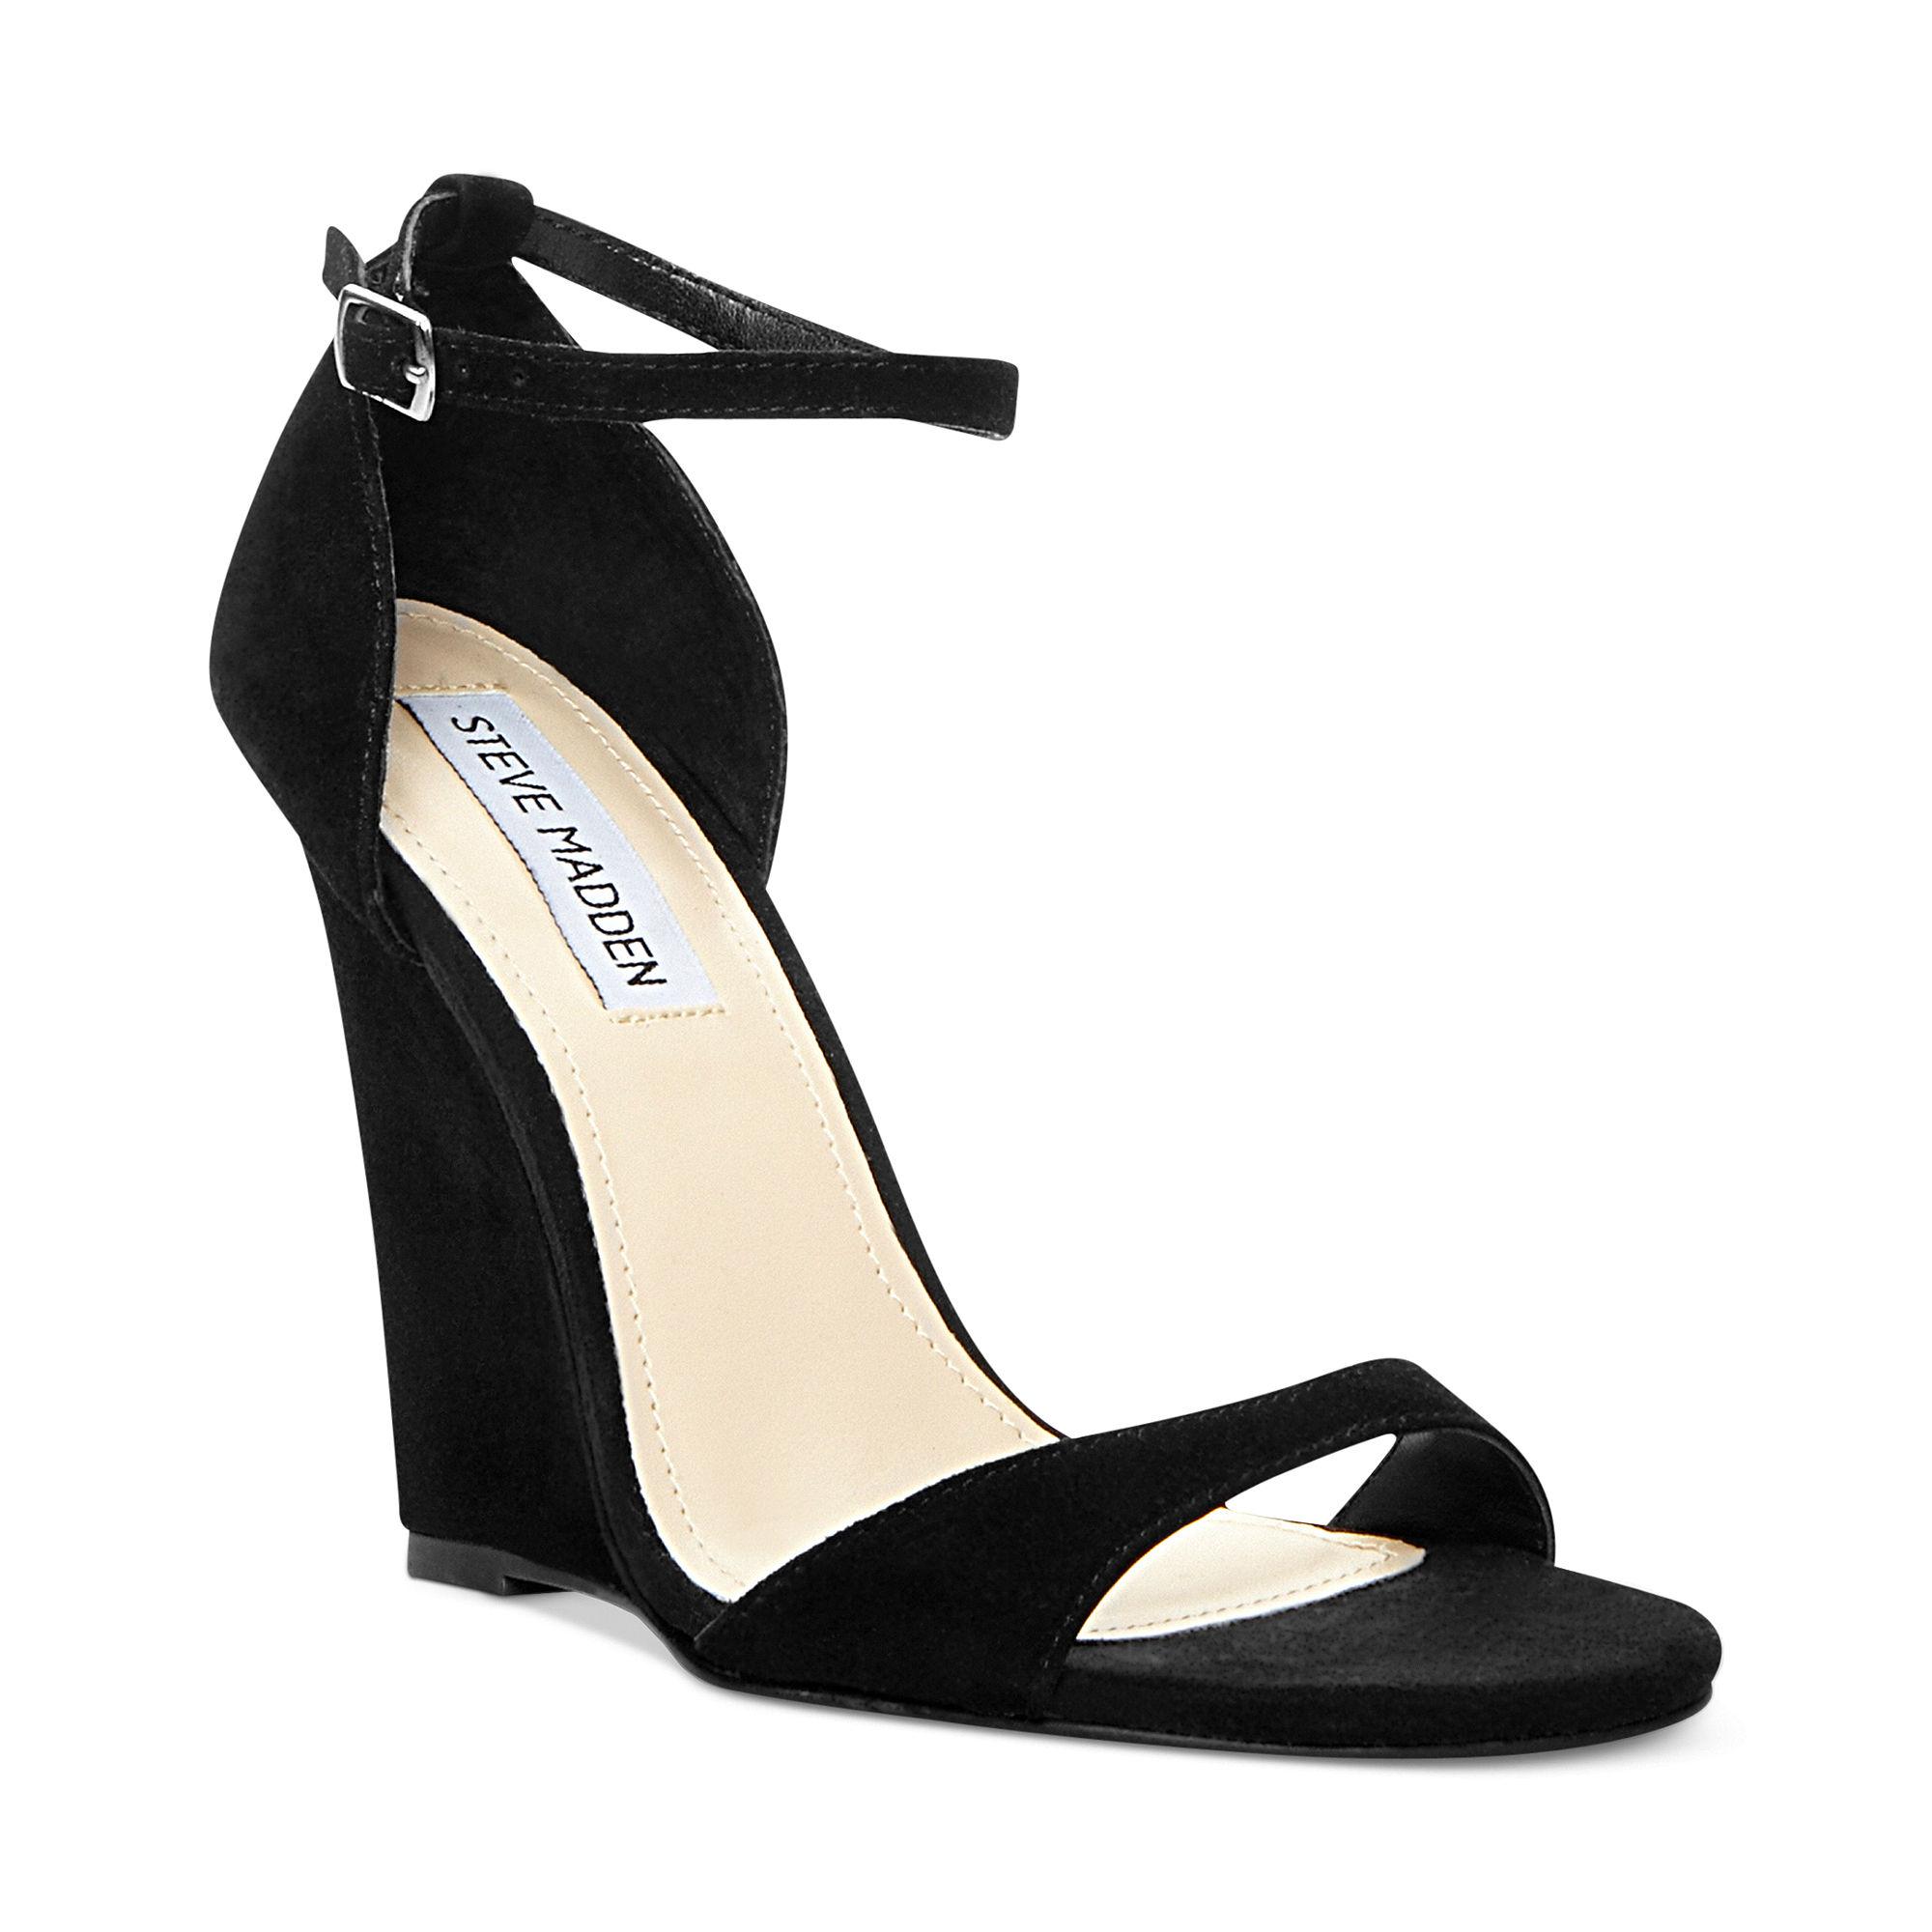 Steve Madden Reeldeal Wedge Sandals In Black Lyst